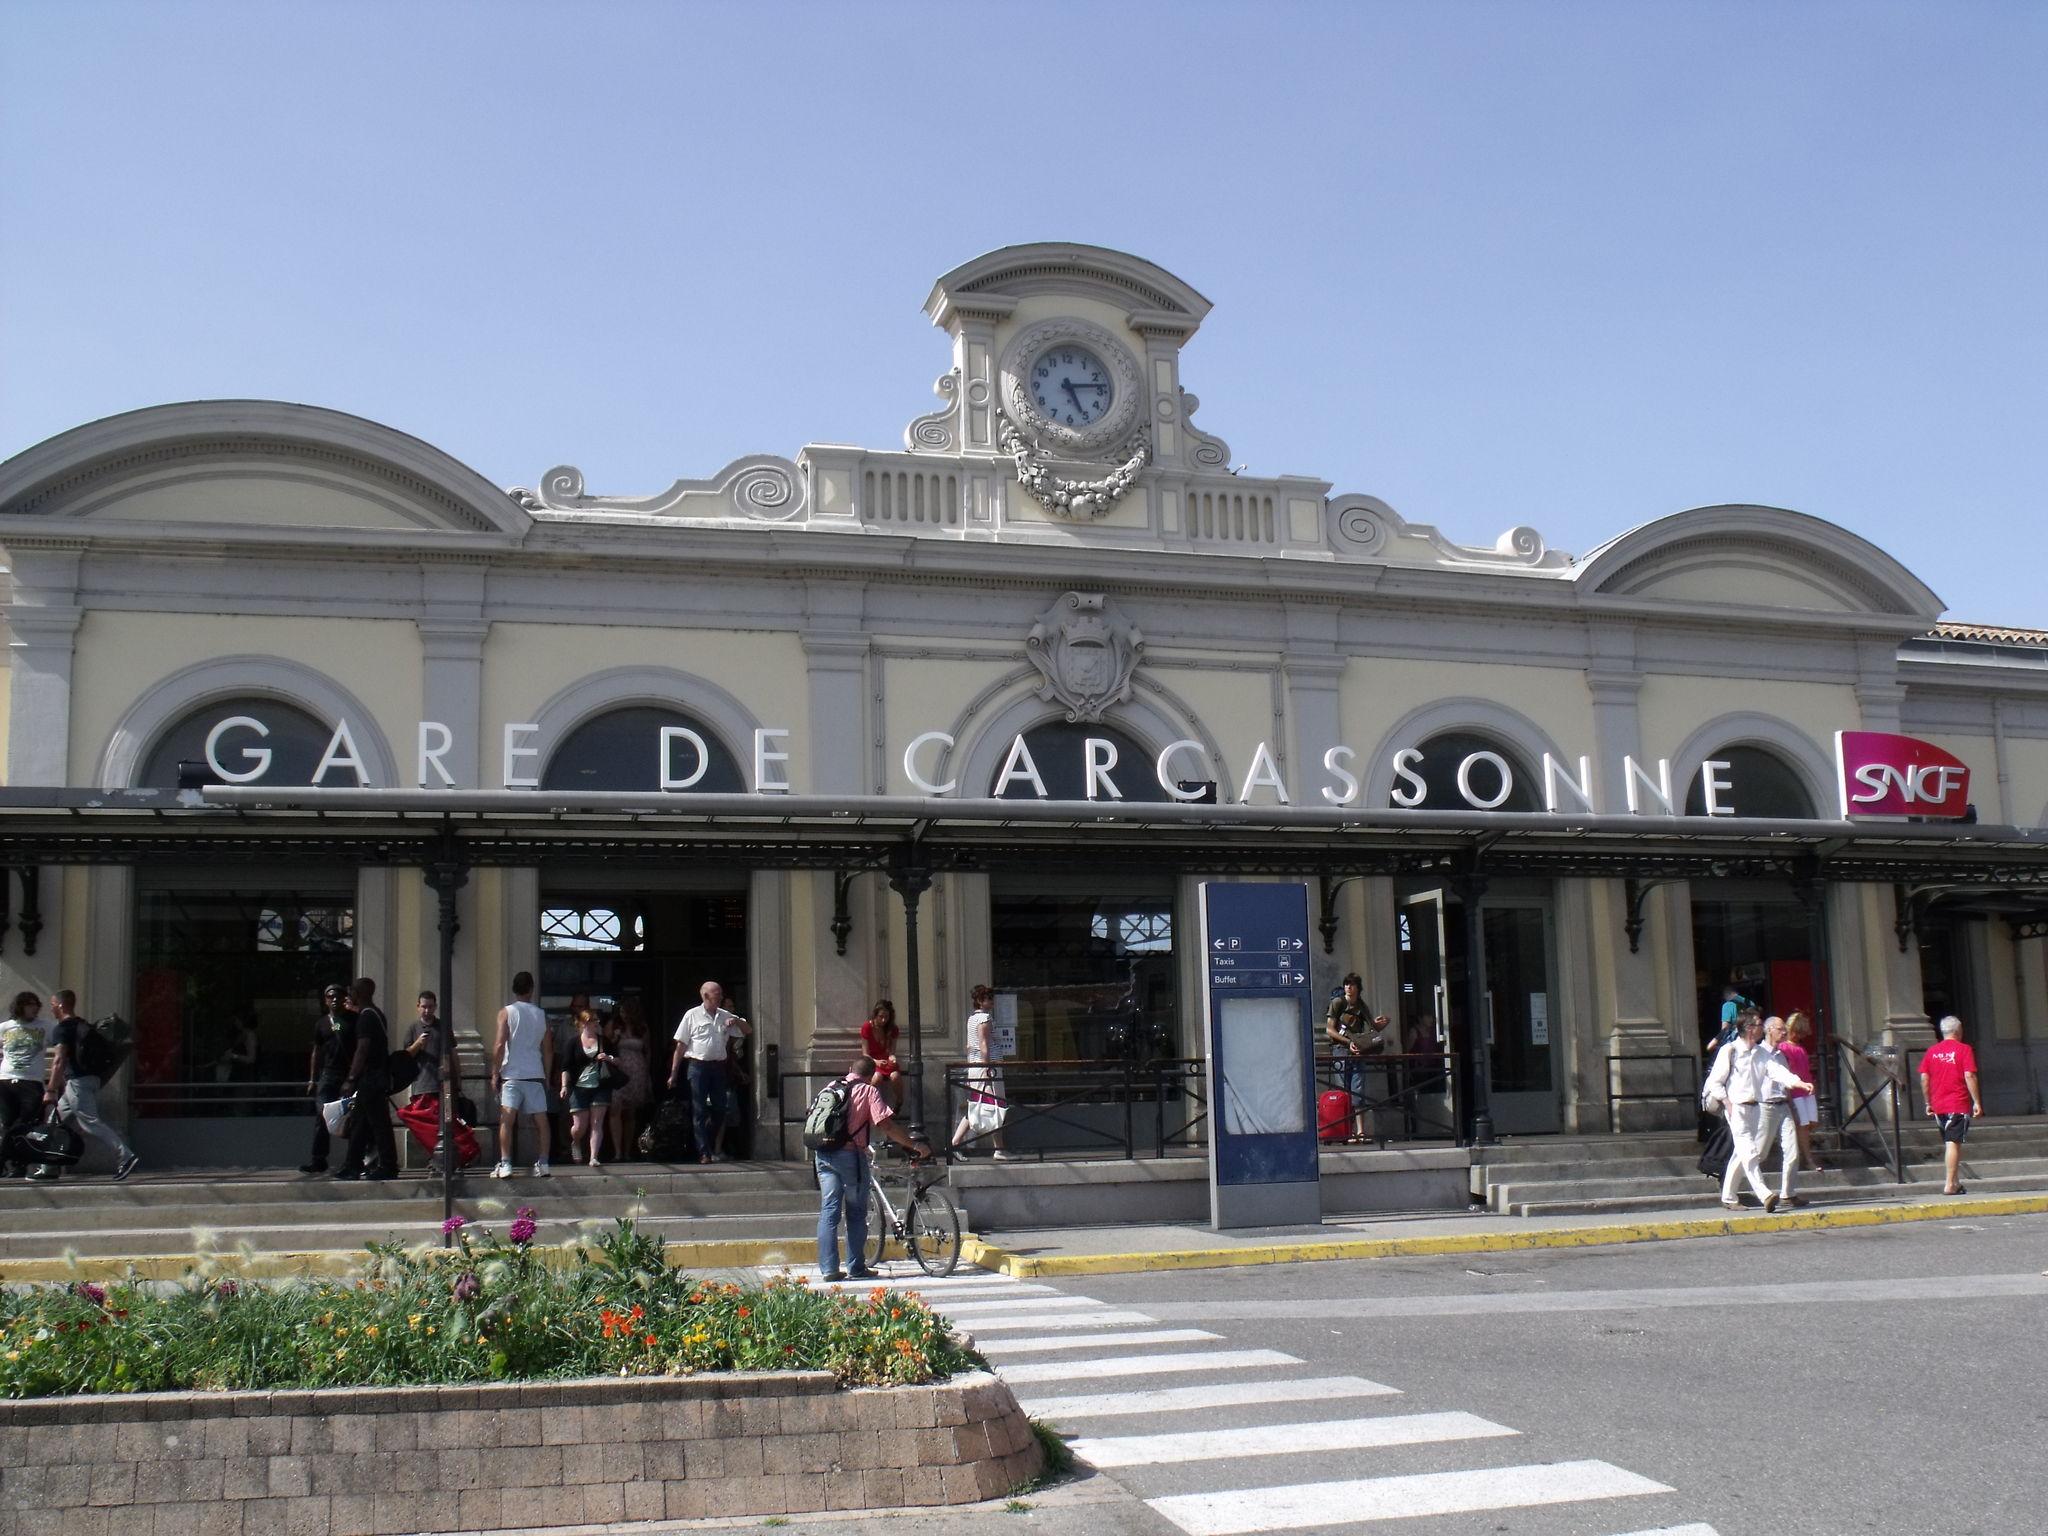 Carcassone (Aude)